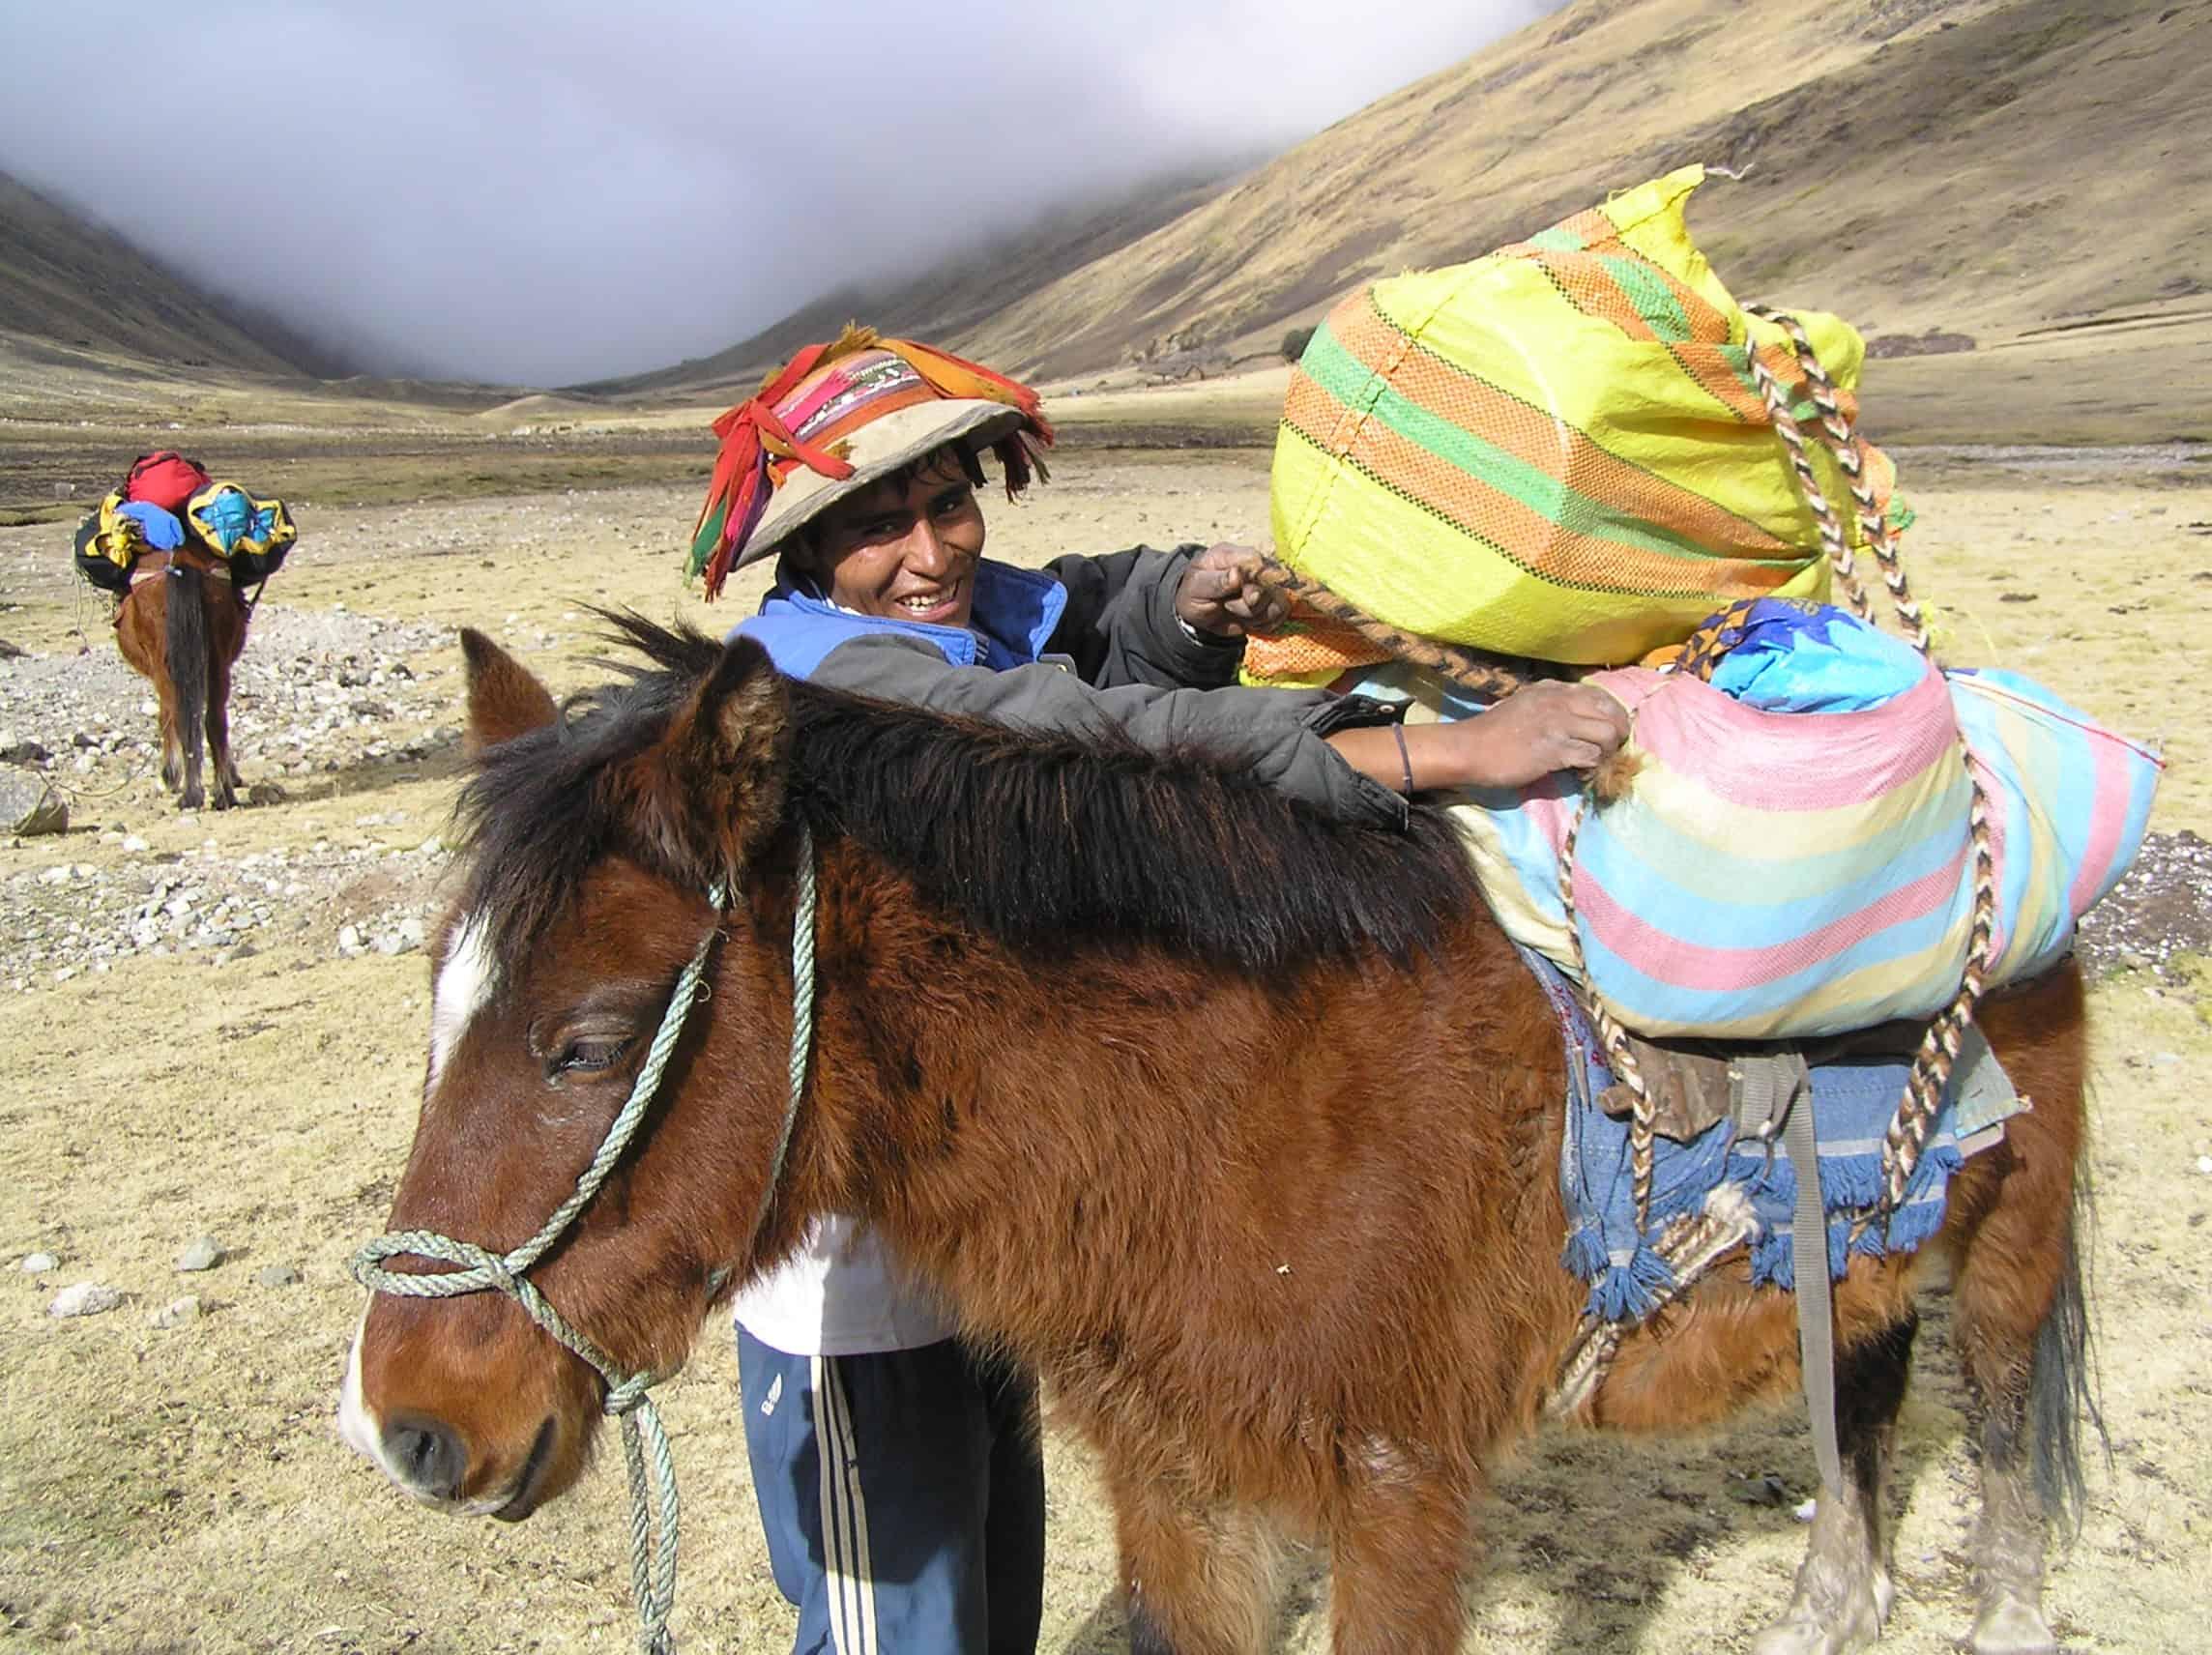 Apus Peru opportunities for local communities